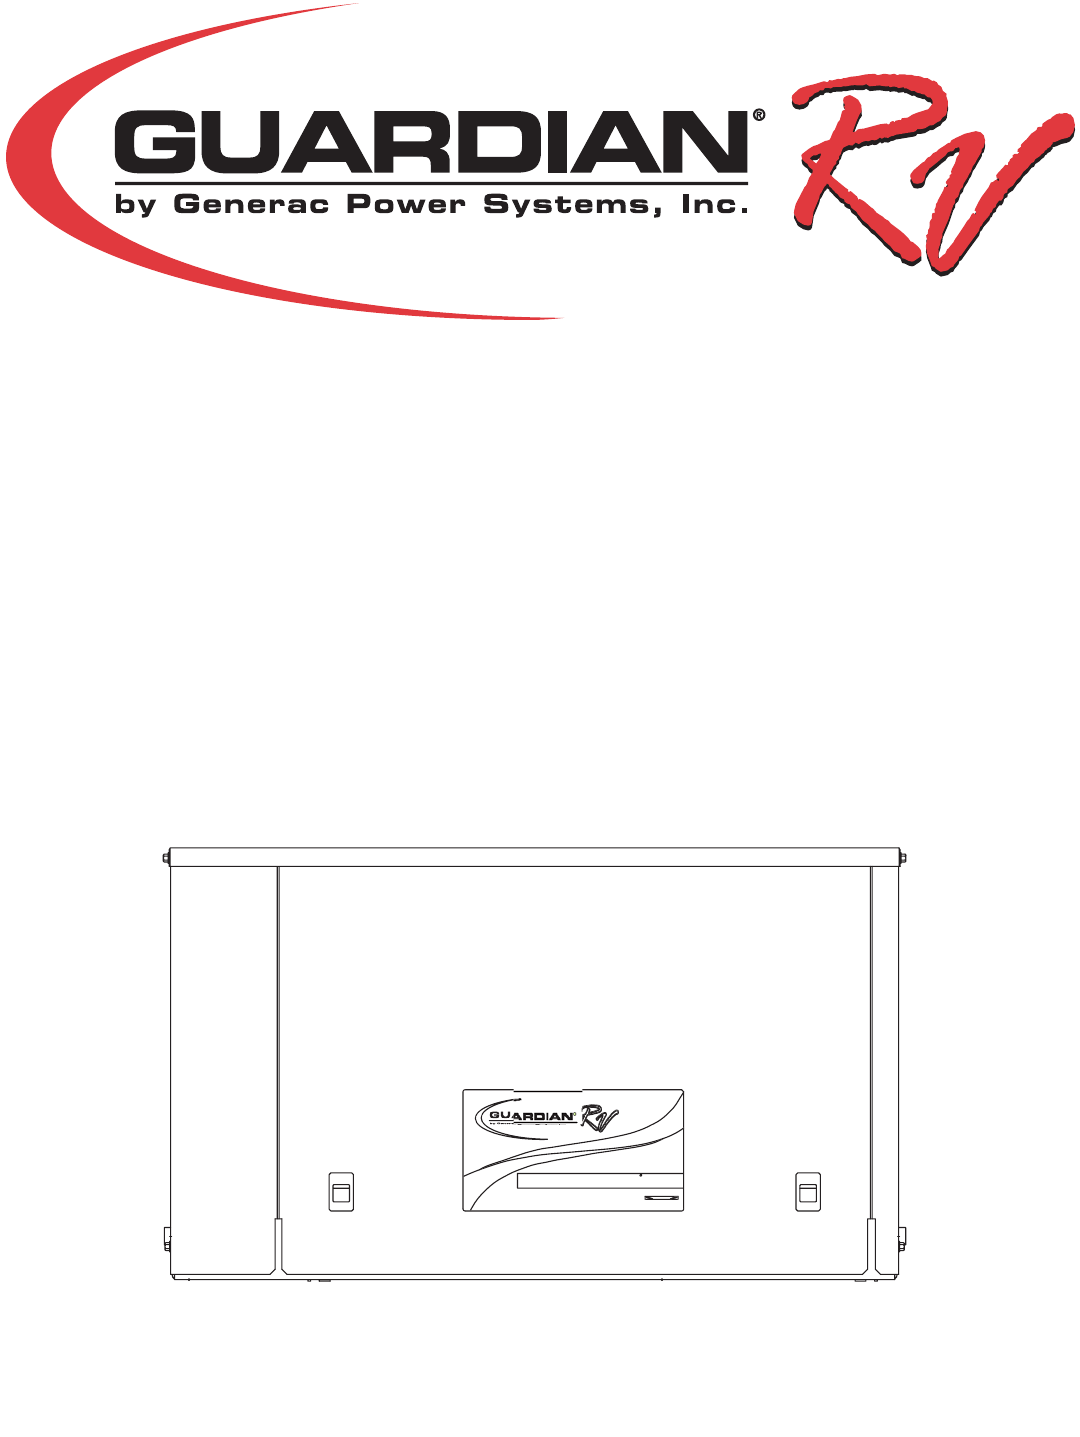 Generac 004702 0 004703 004704 004705 004706 004707 Owners